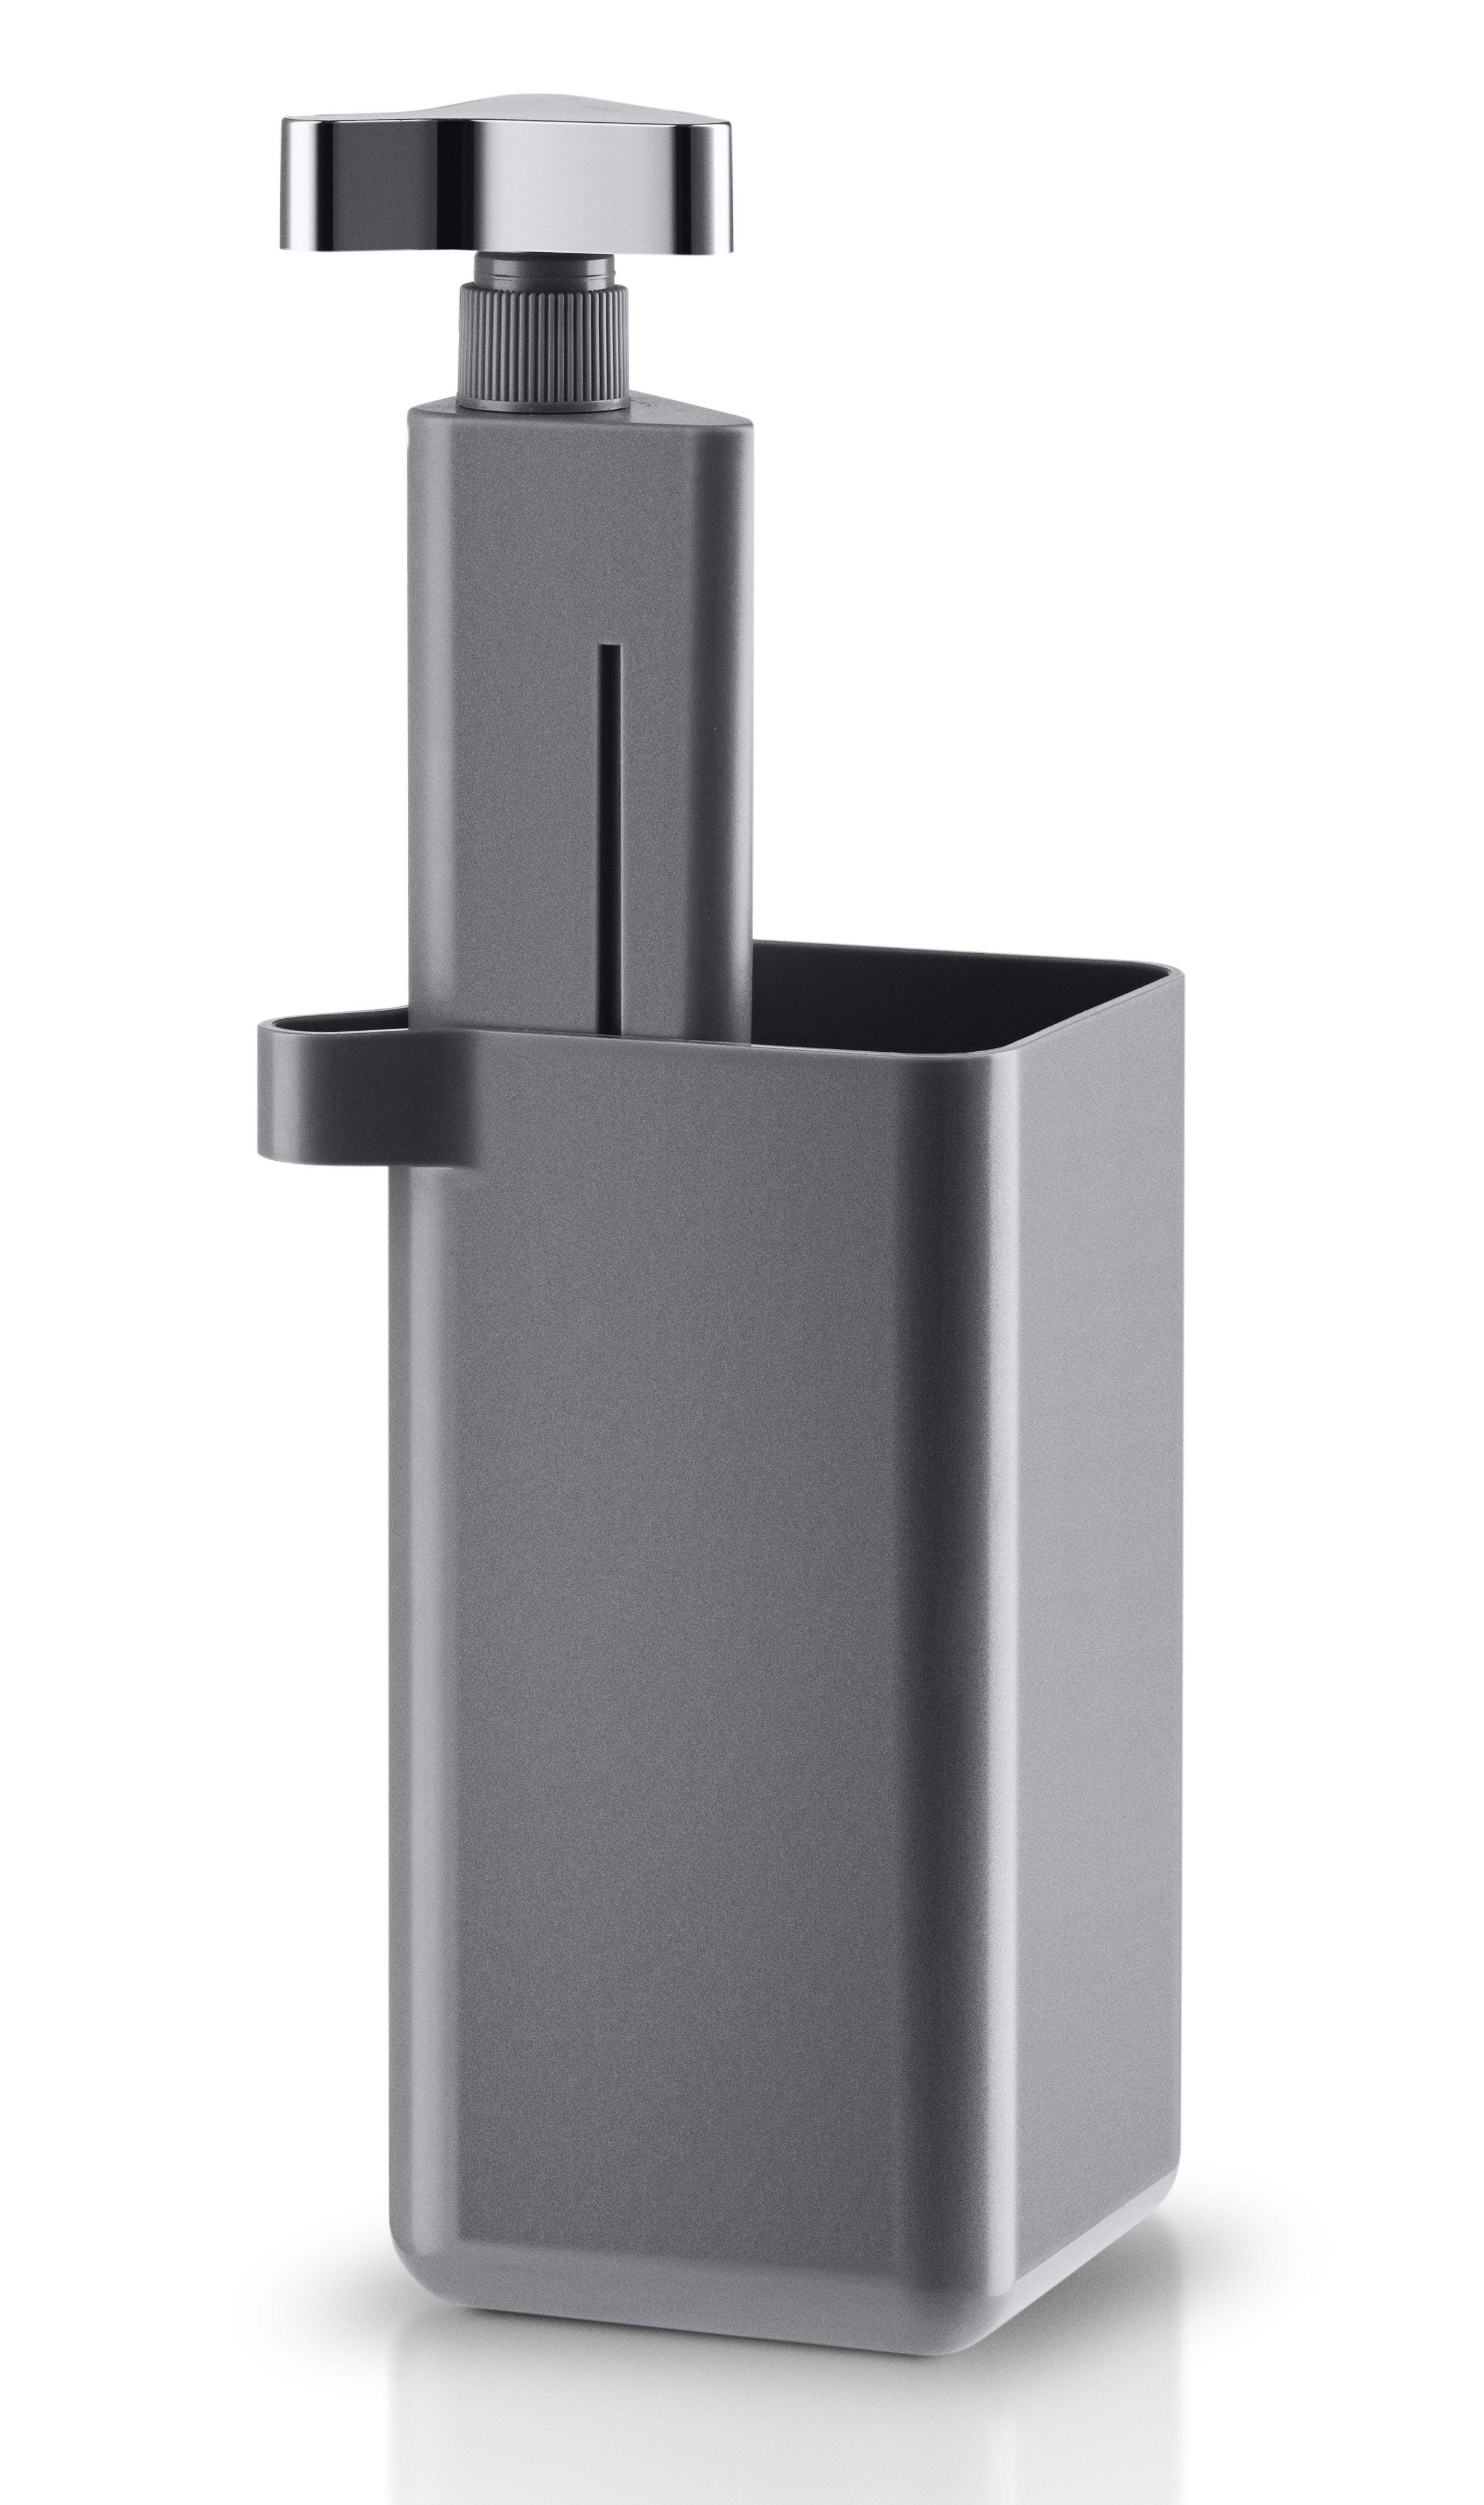 soap 39 n tidy beh lter eva solo distributeur de savon. Black Bedroom Furniture Sets. Home Design Ideas